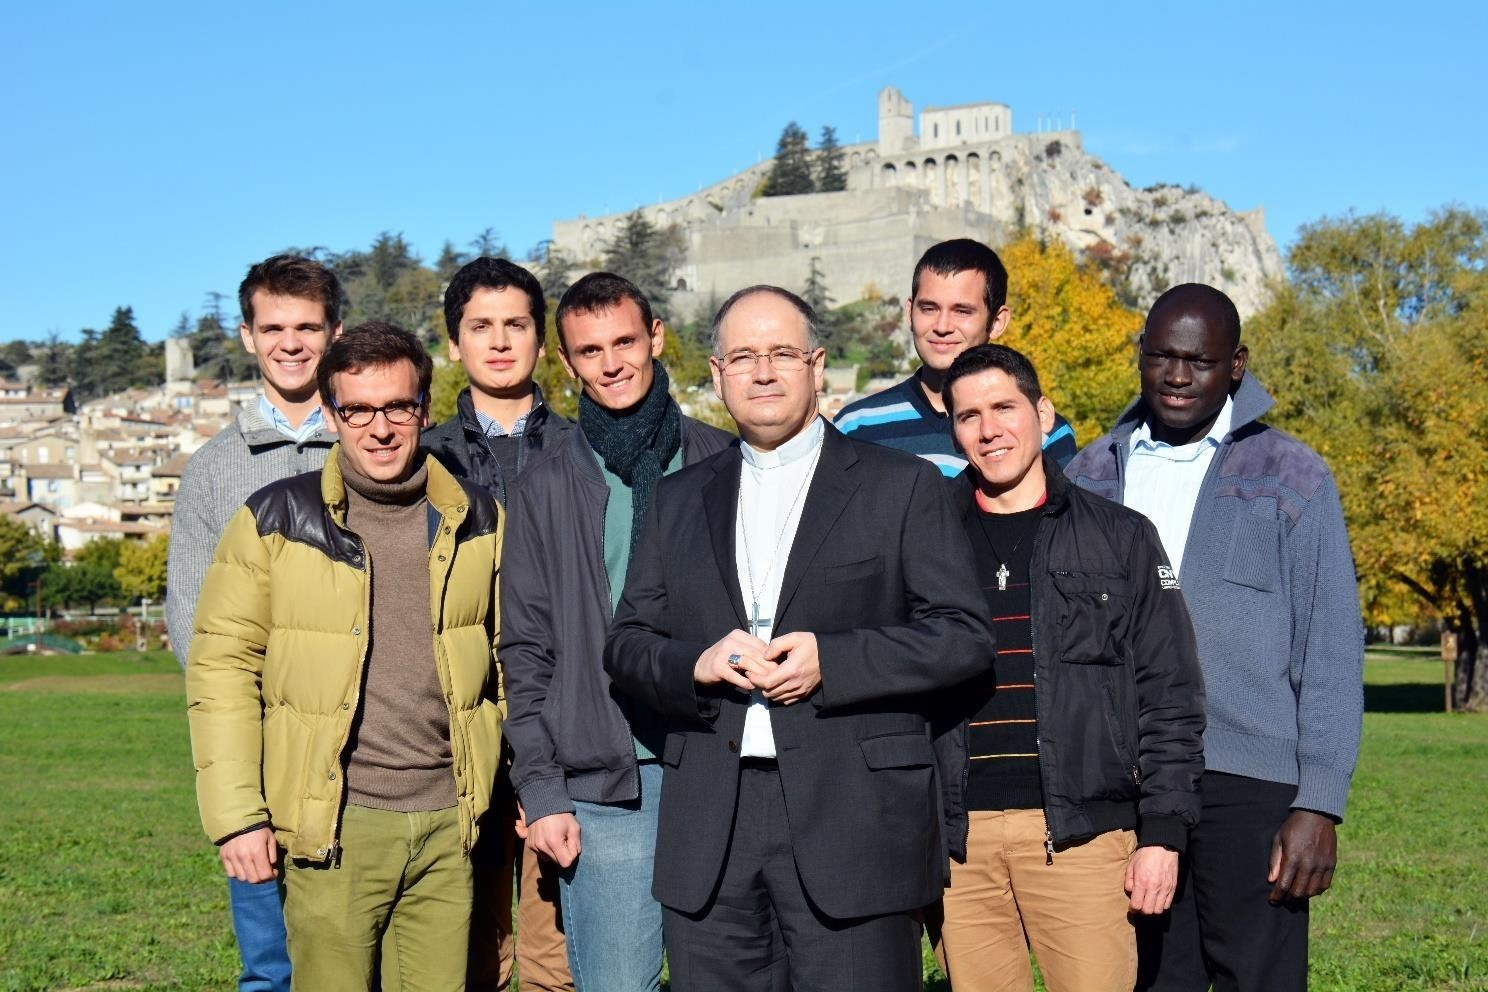 Mgr Naud évêque de Digne et ses séminaristes